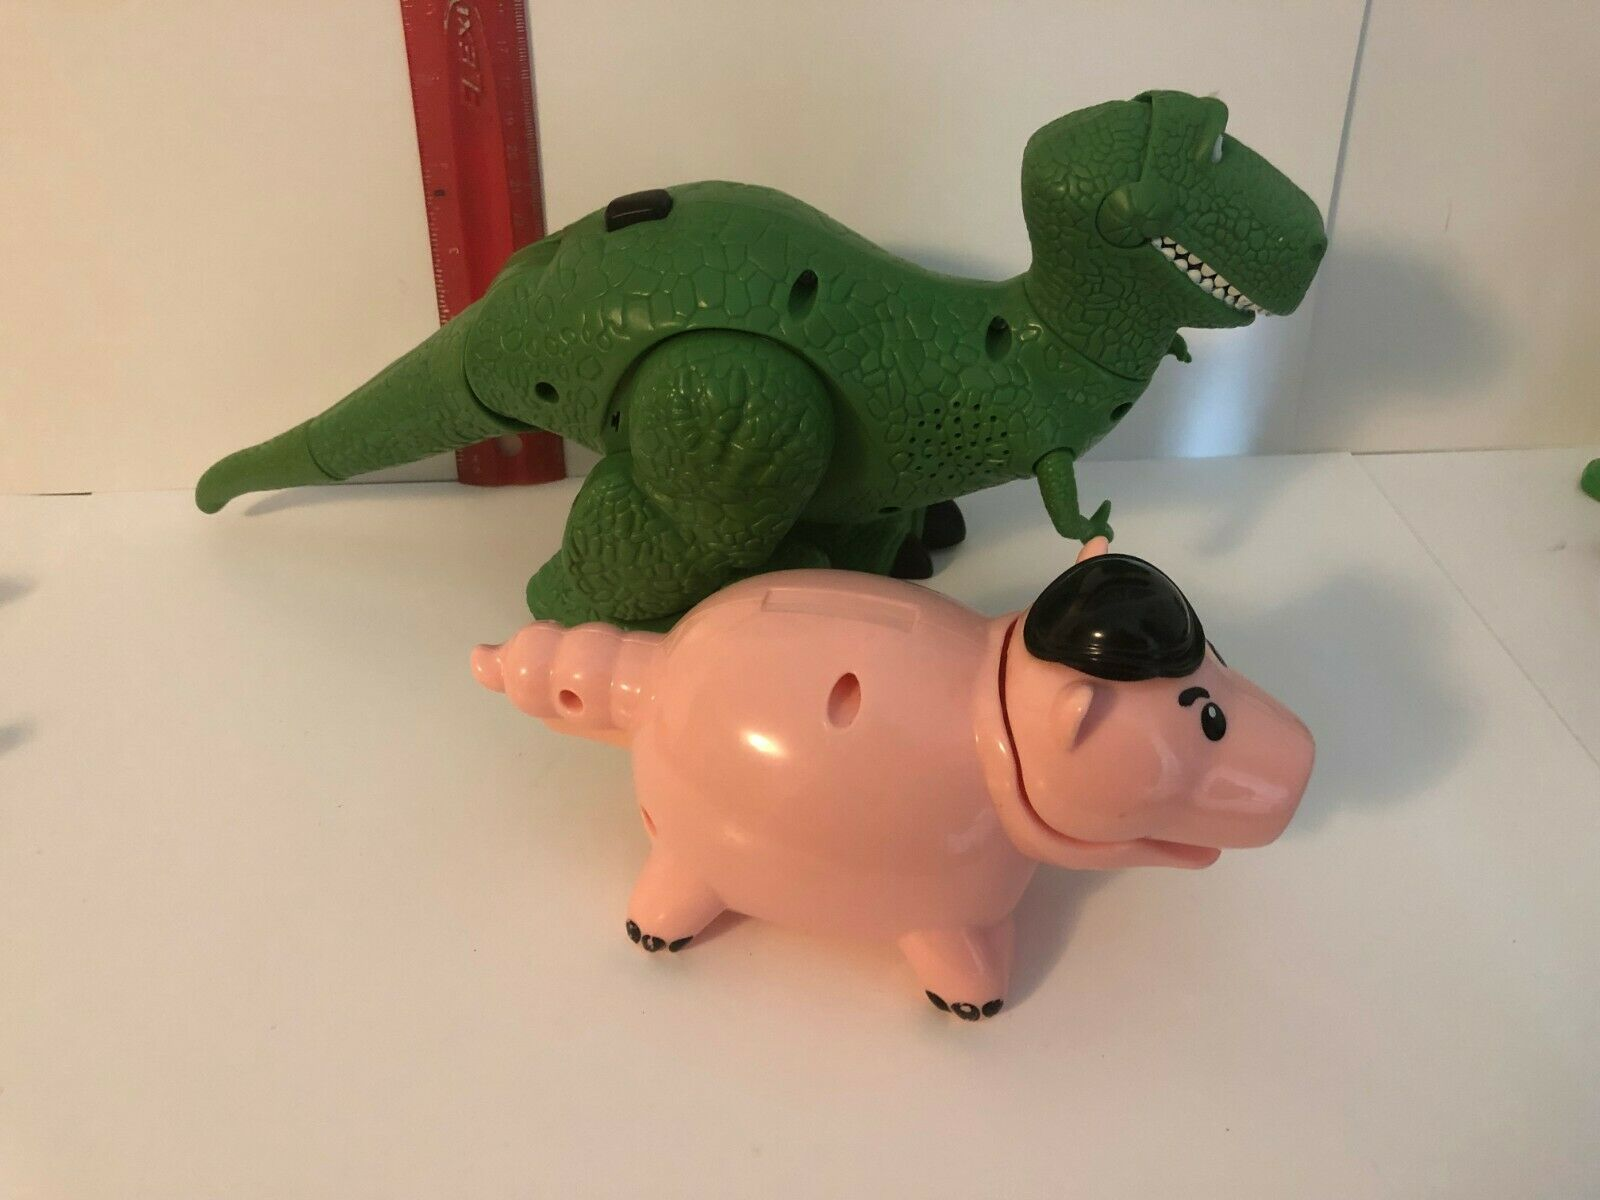 Toy Story Talking Walking Rex Loose Figure Mattel 2010 Tested Works Excellent